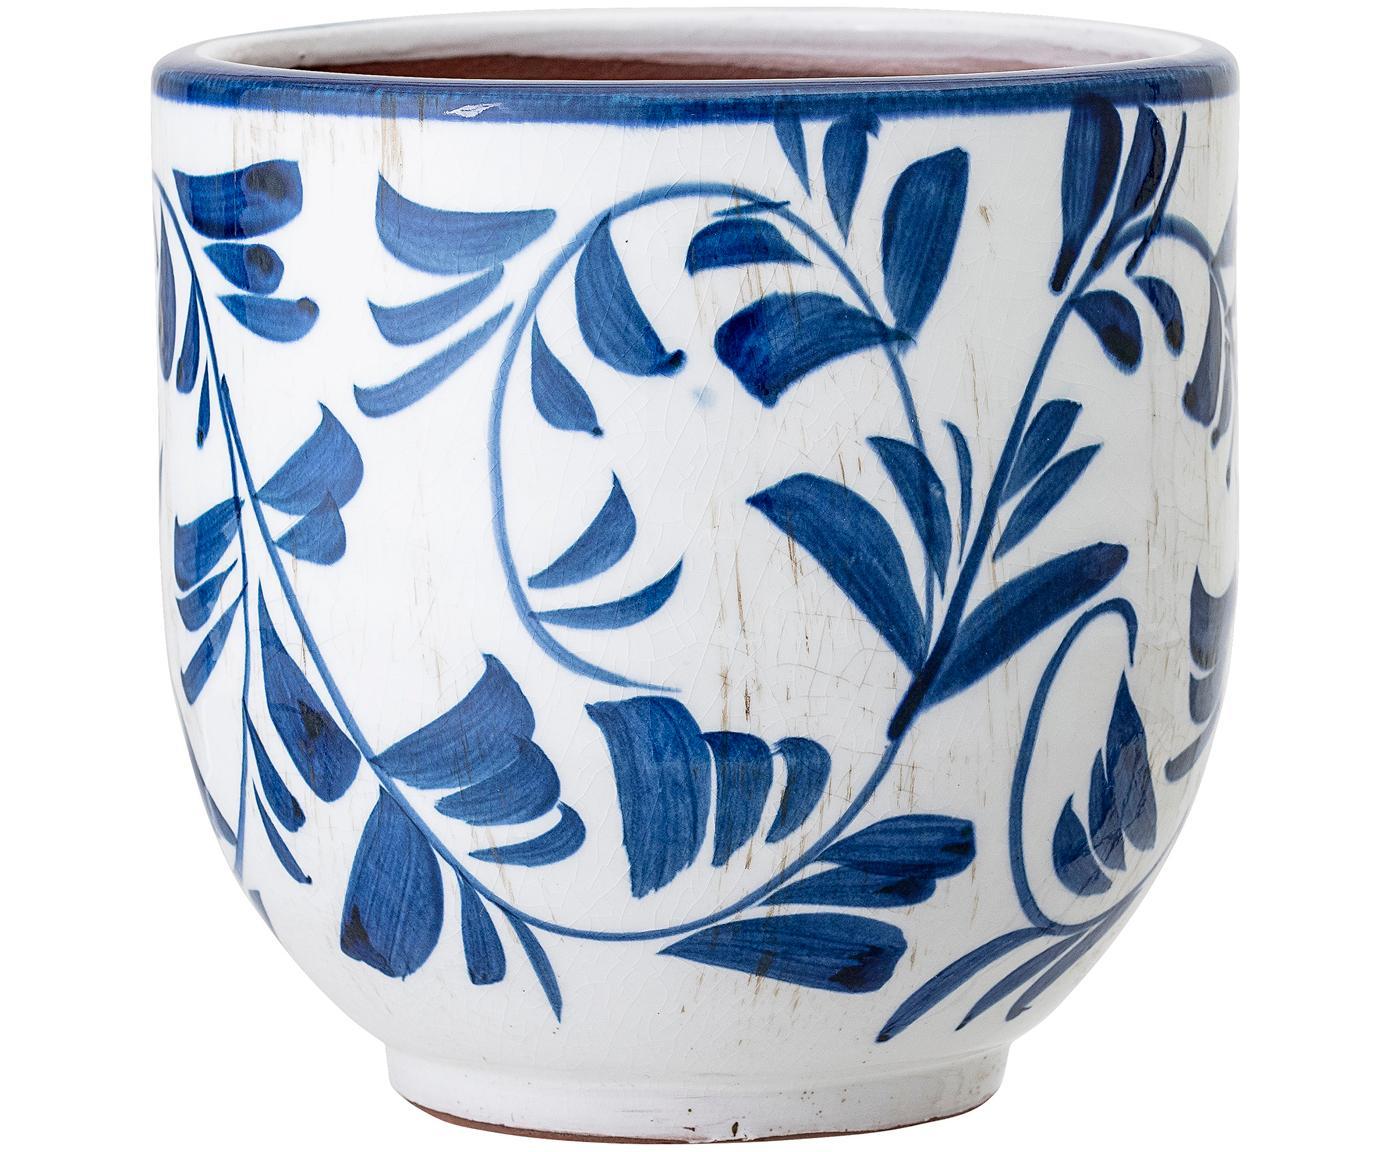 Macetero Jarl, Terracota, Azul, blanco, Ø 14 x Al 14 cm